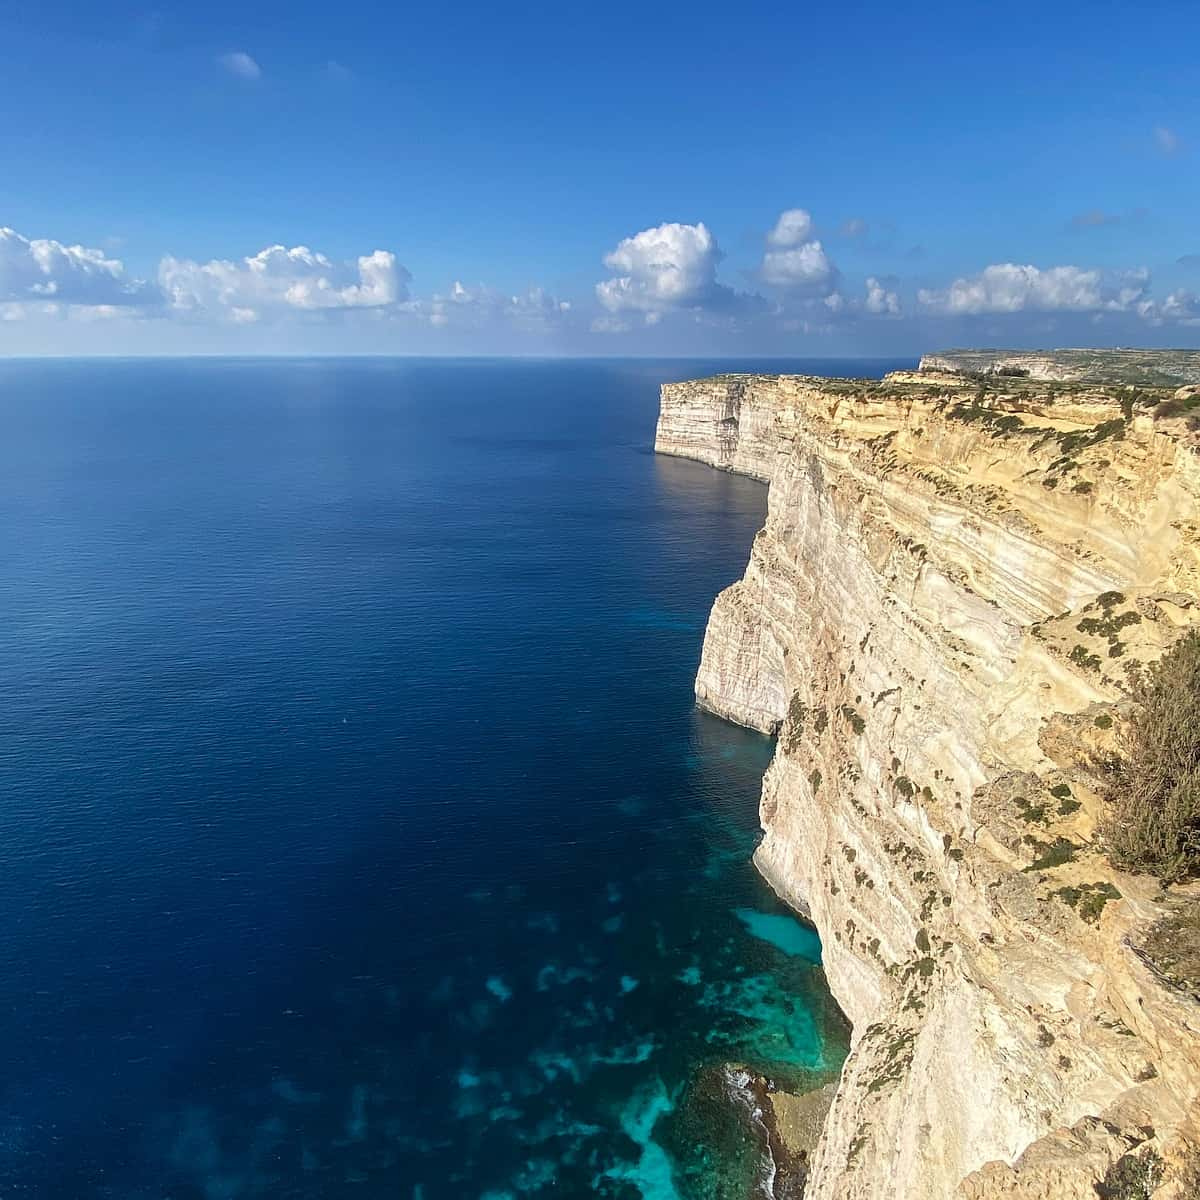 Fernwanderung Malta Gozo Etappe 4 07